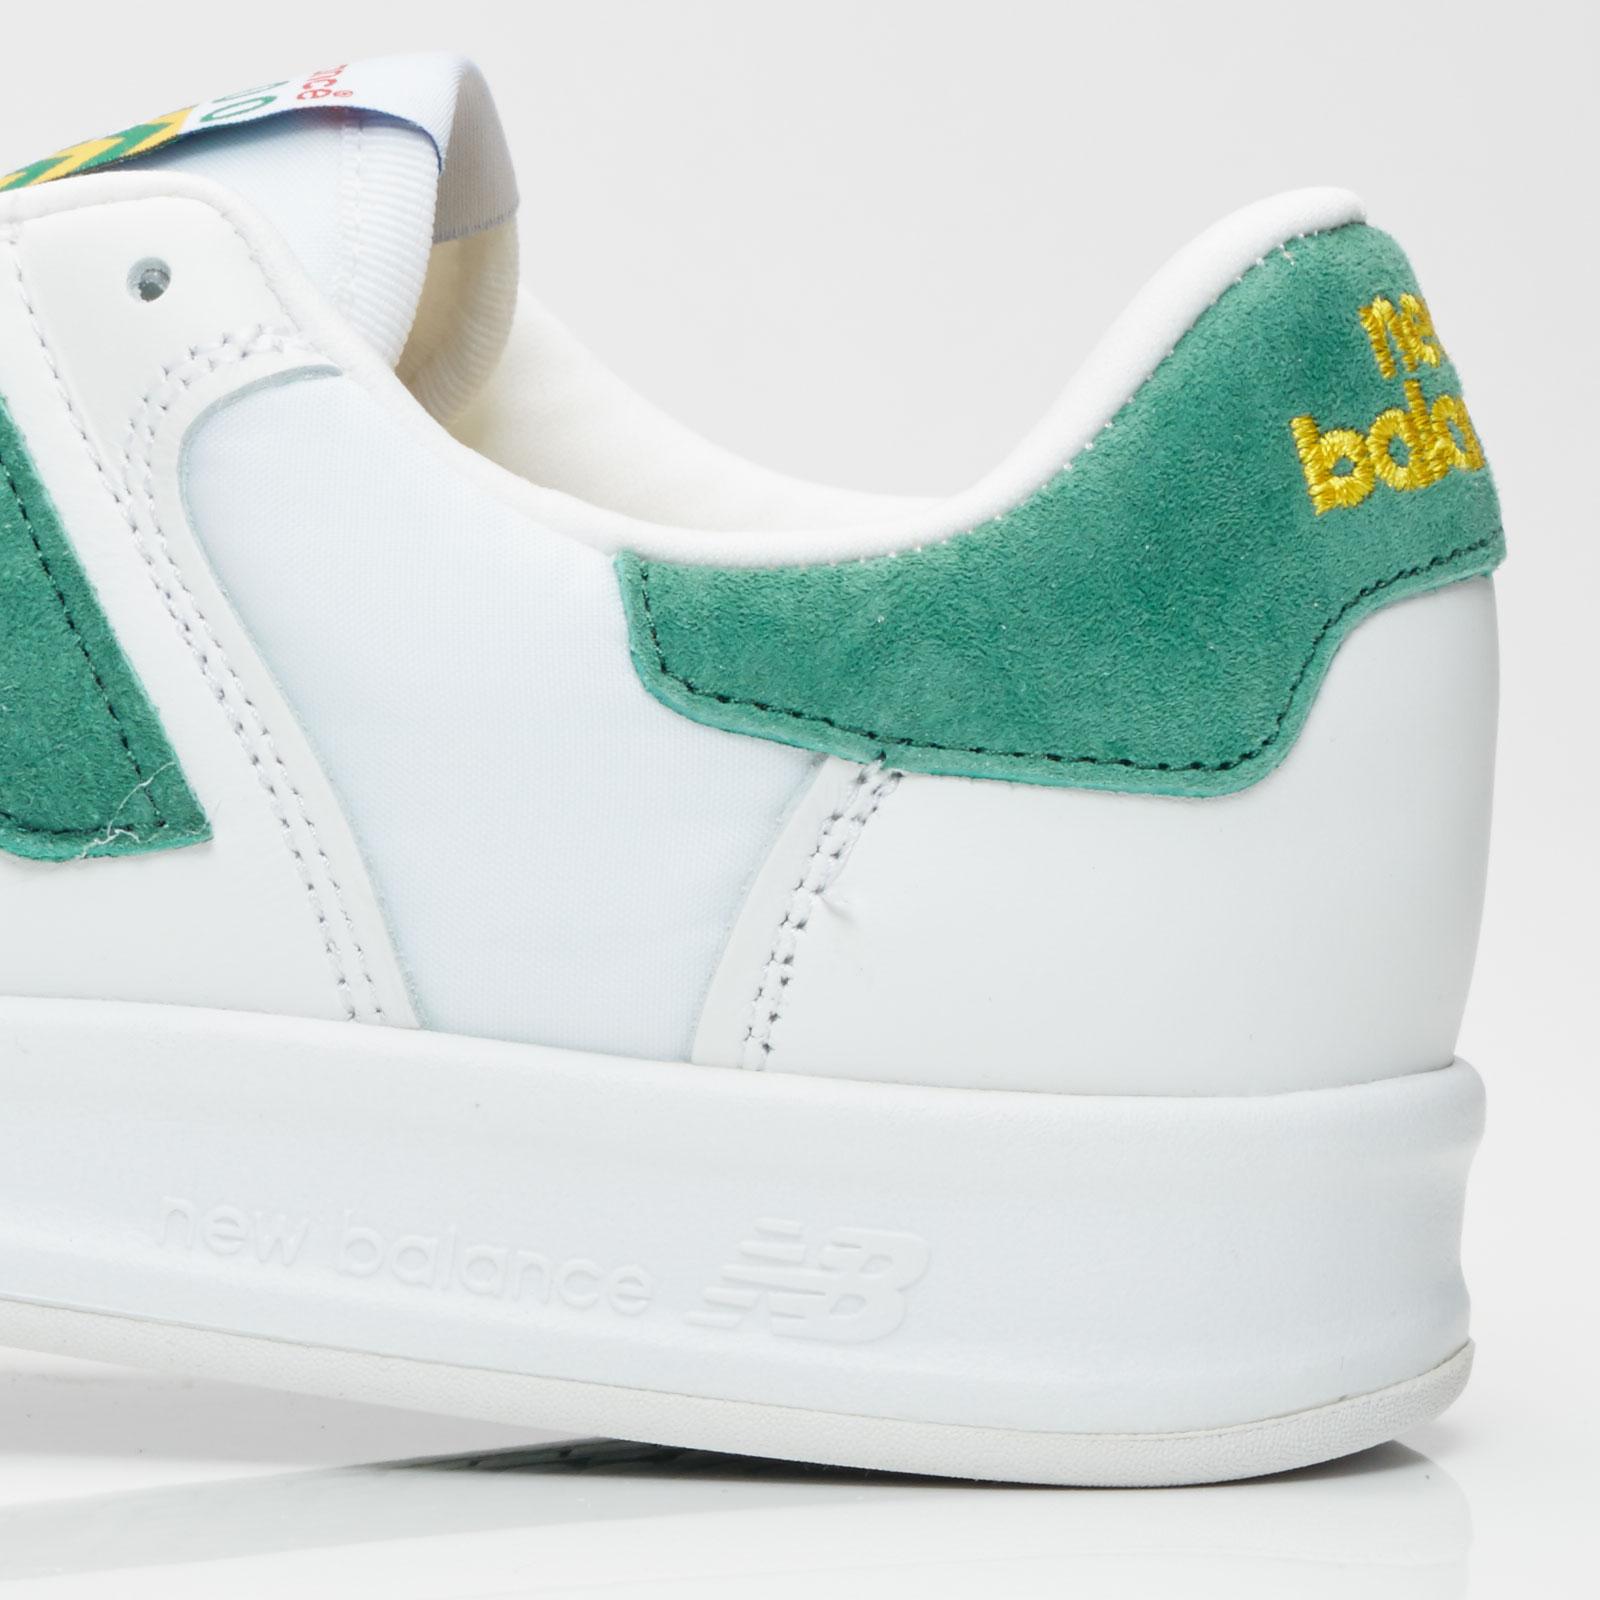 Sneakers Et Balance Sneakersnstuff New Ct300 Ct300cf wnF8O7Hxq7